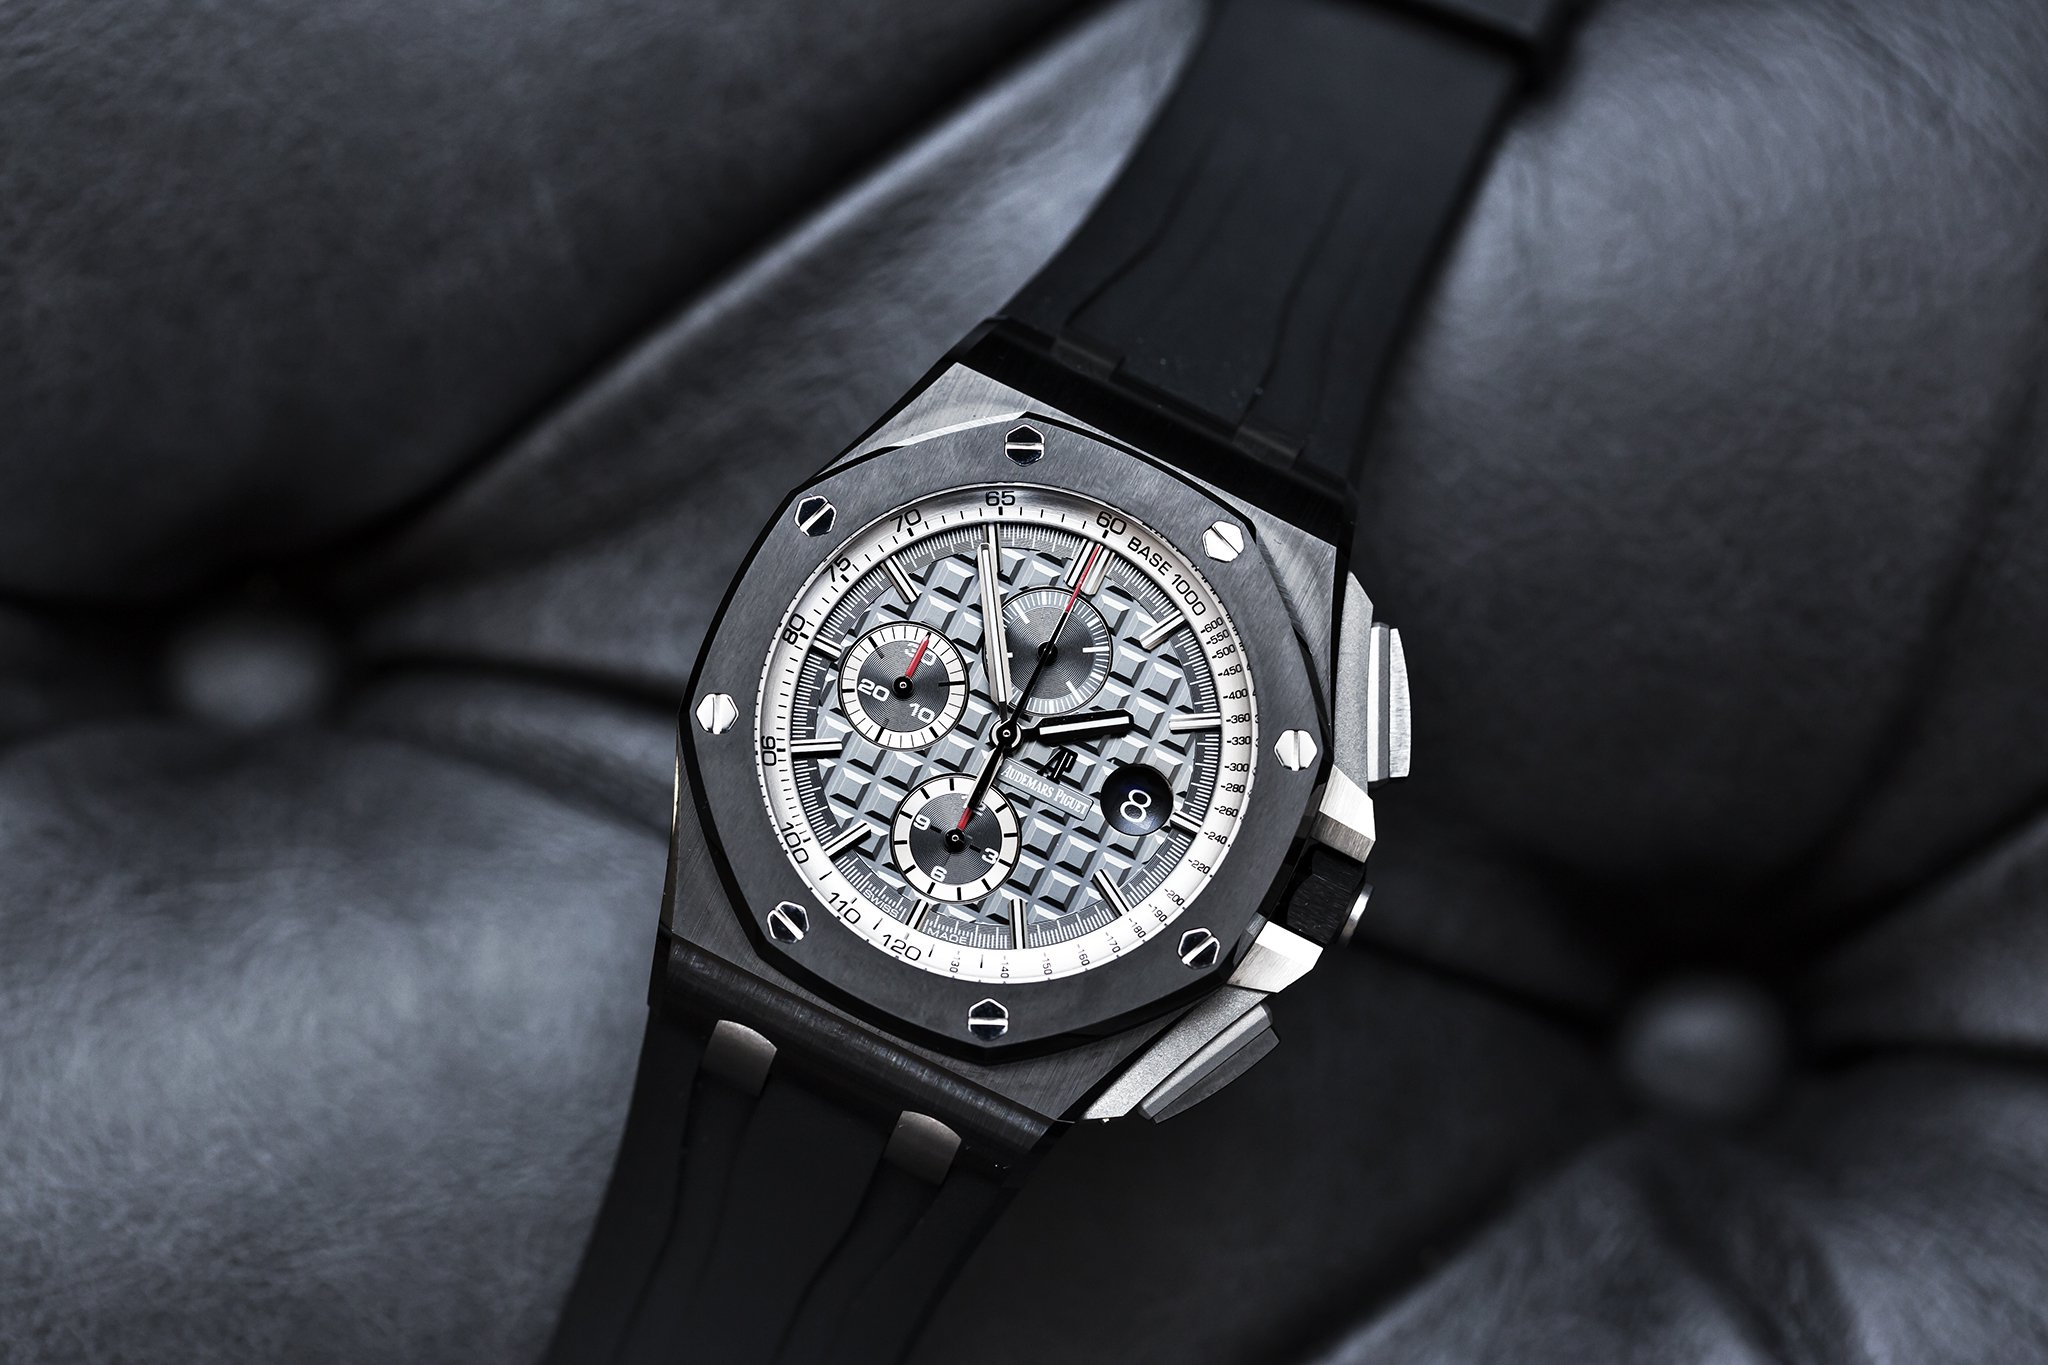 Audemars Piguet Royal Oak Offshore Chronograph Ceramic Watch Replica